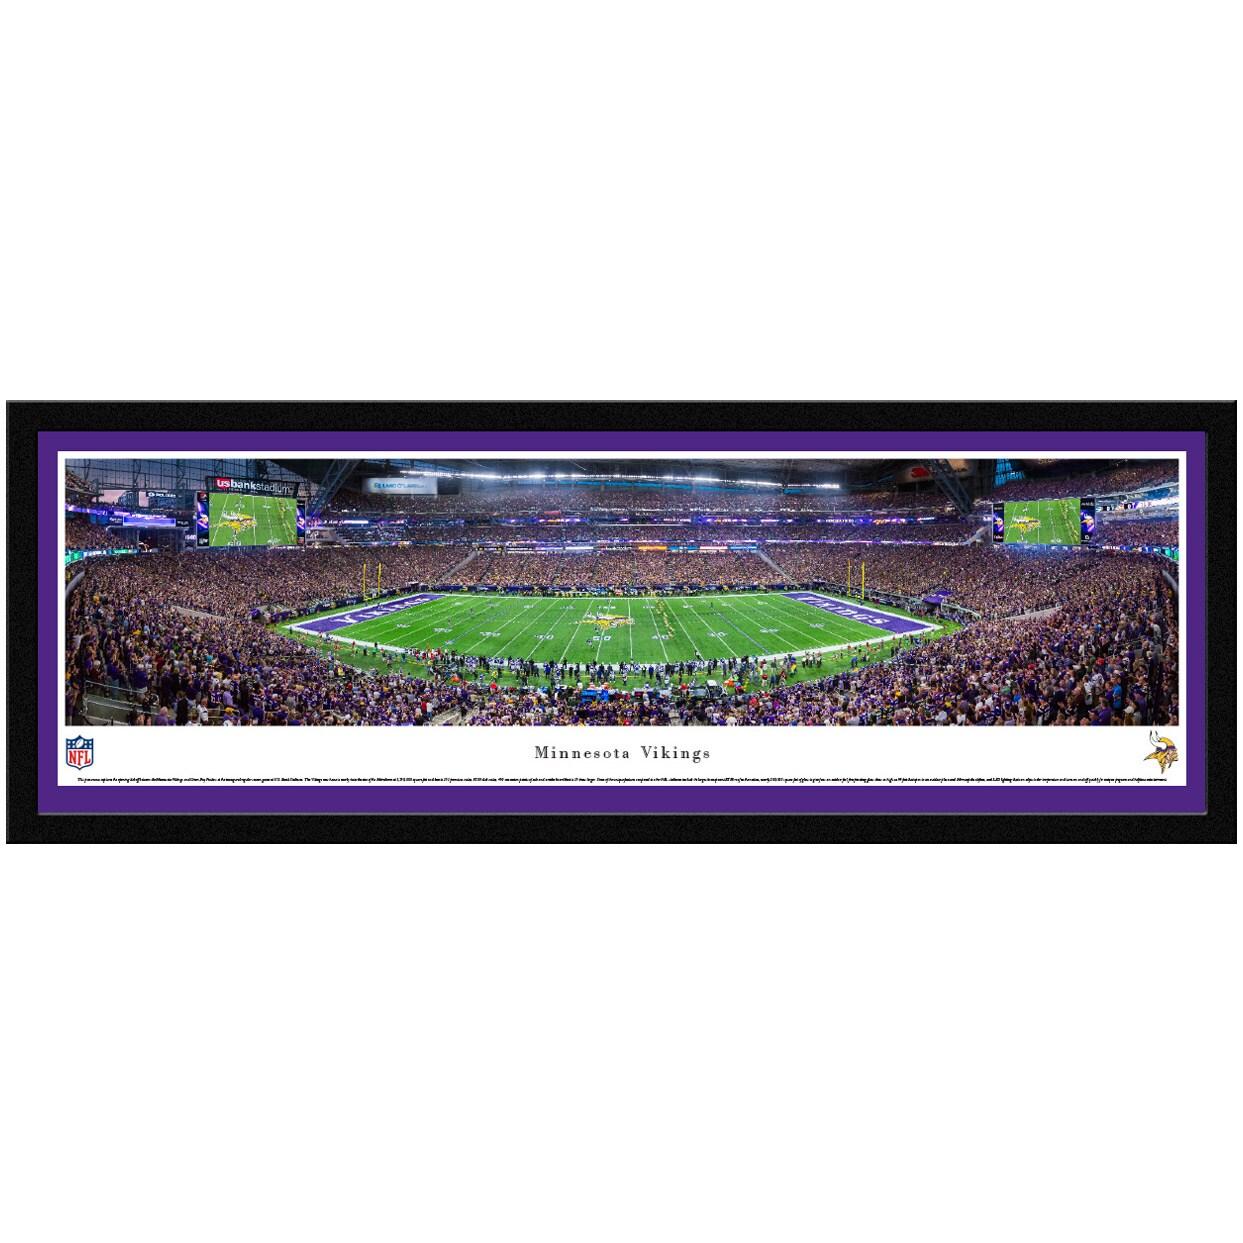 "Minnesota Vikings 42"" x 15.5"" Select Frame Panoramic Photo"